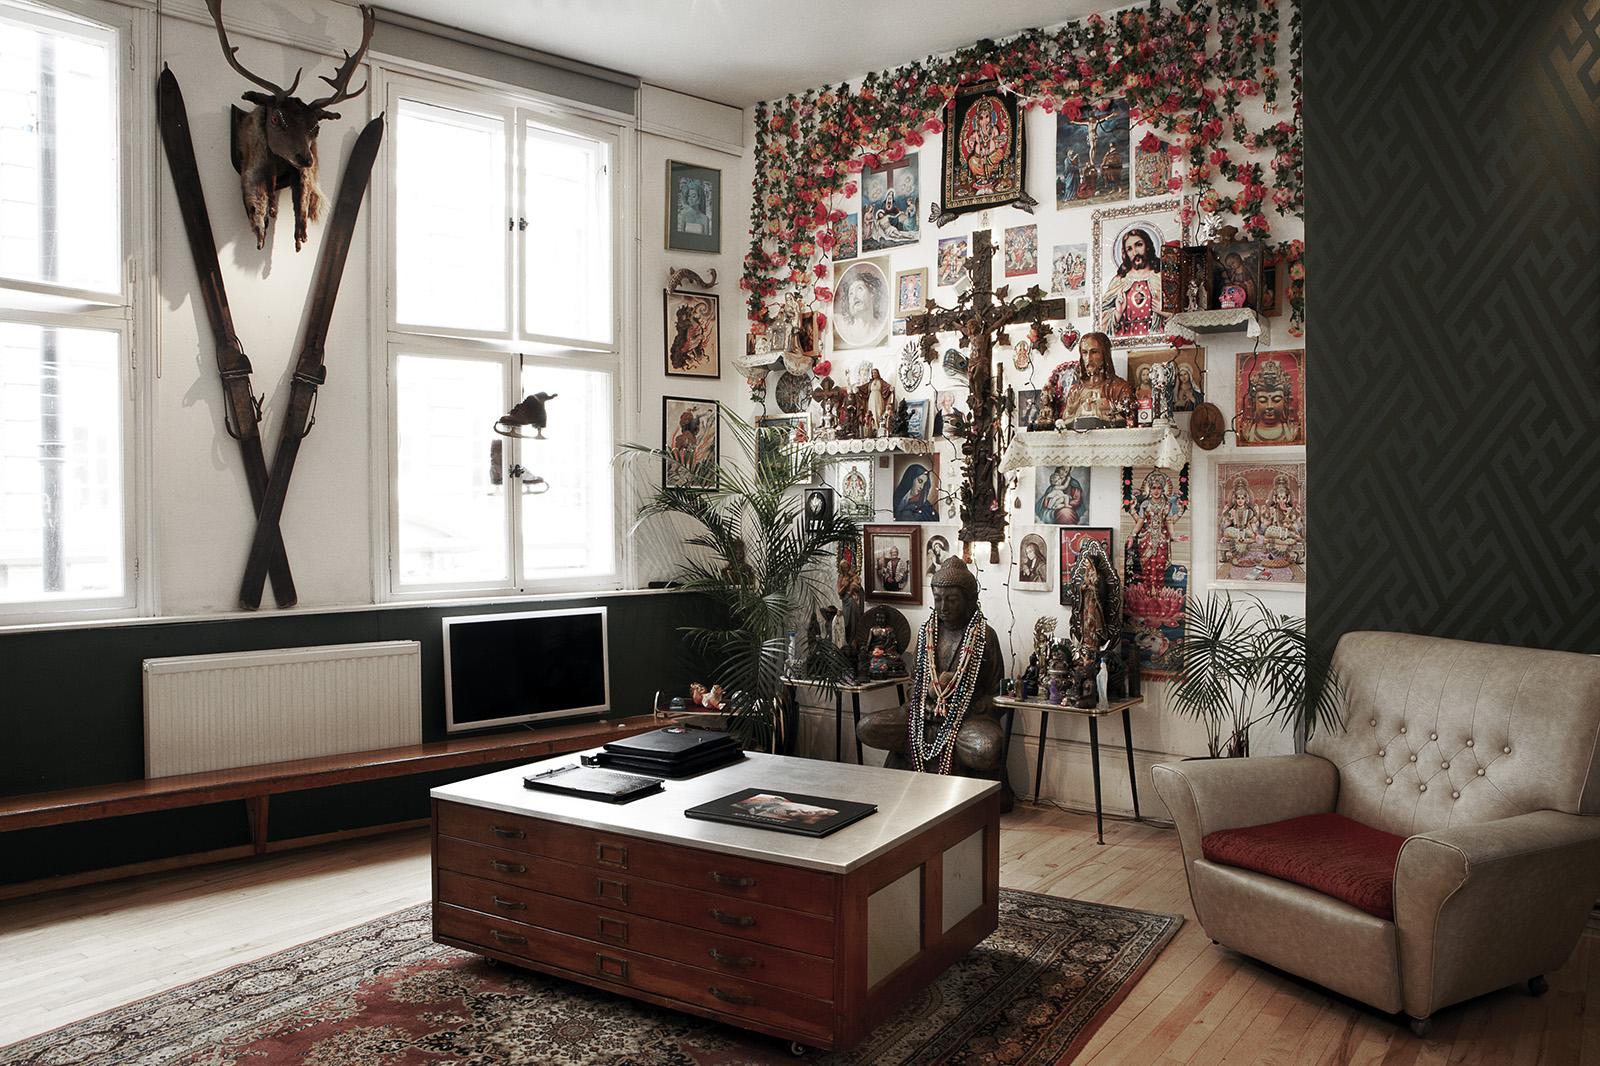 Interiors_291_b.jpg